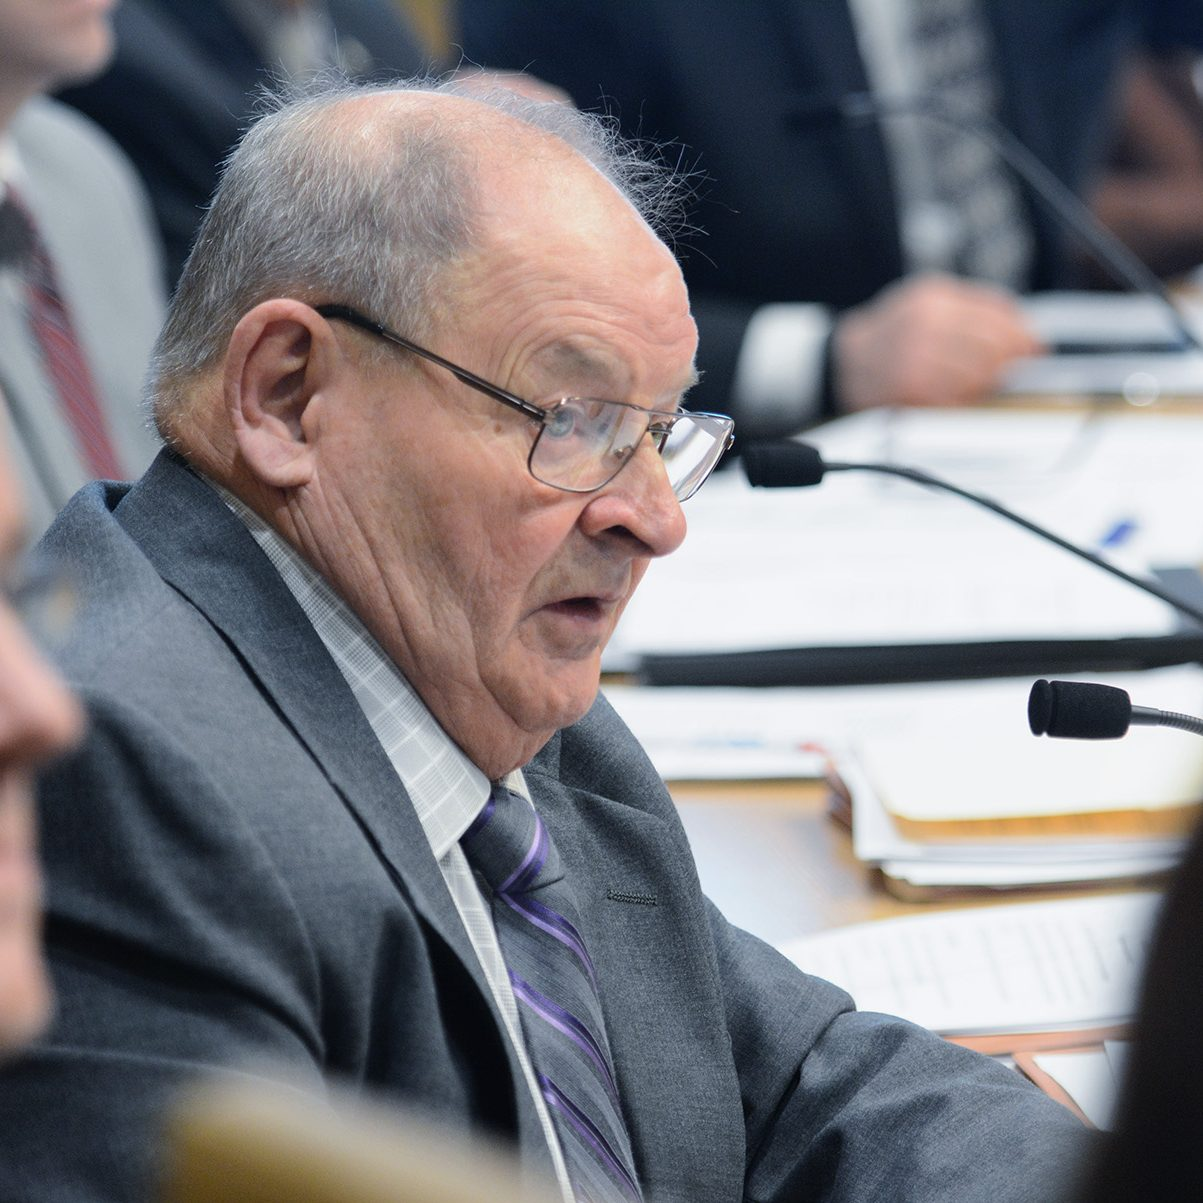 Sen. Gary Dahms hears testimony in committee